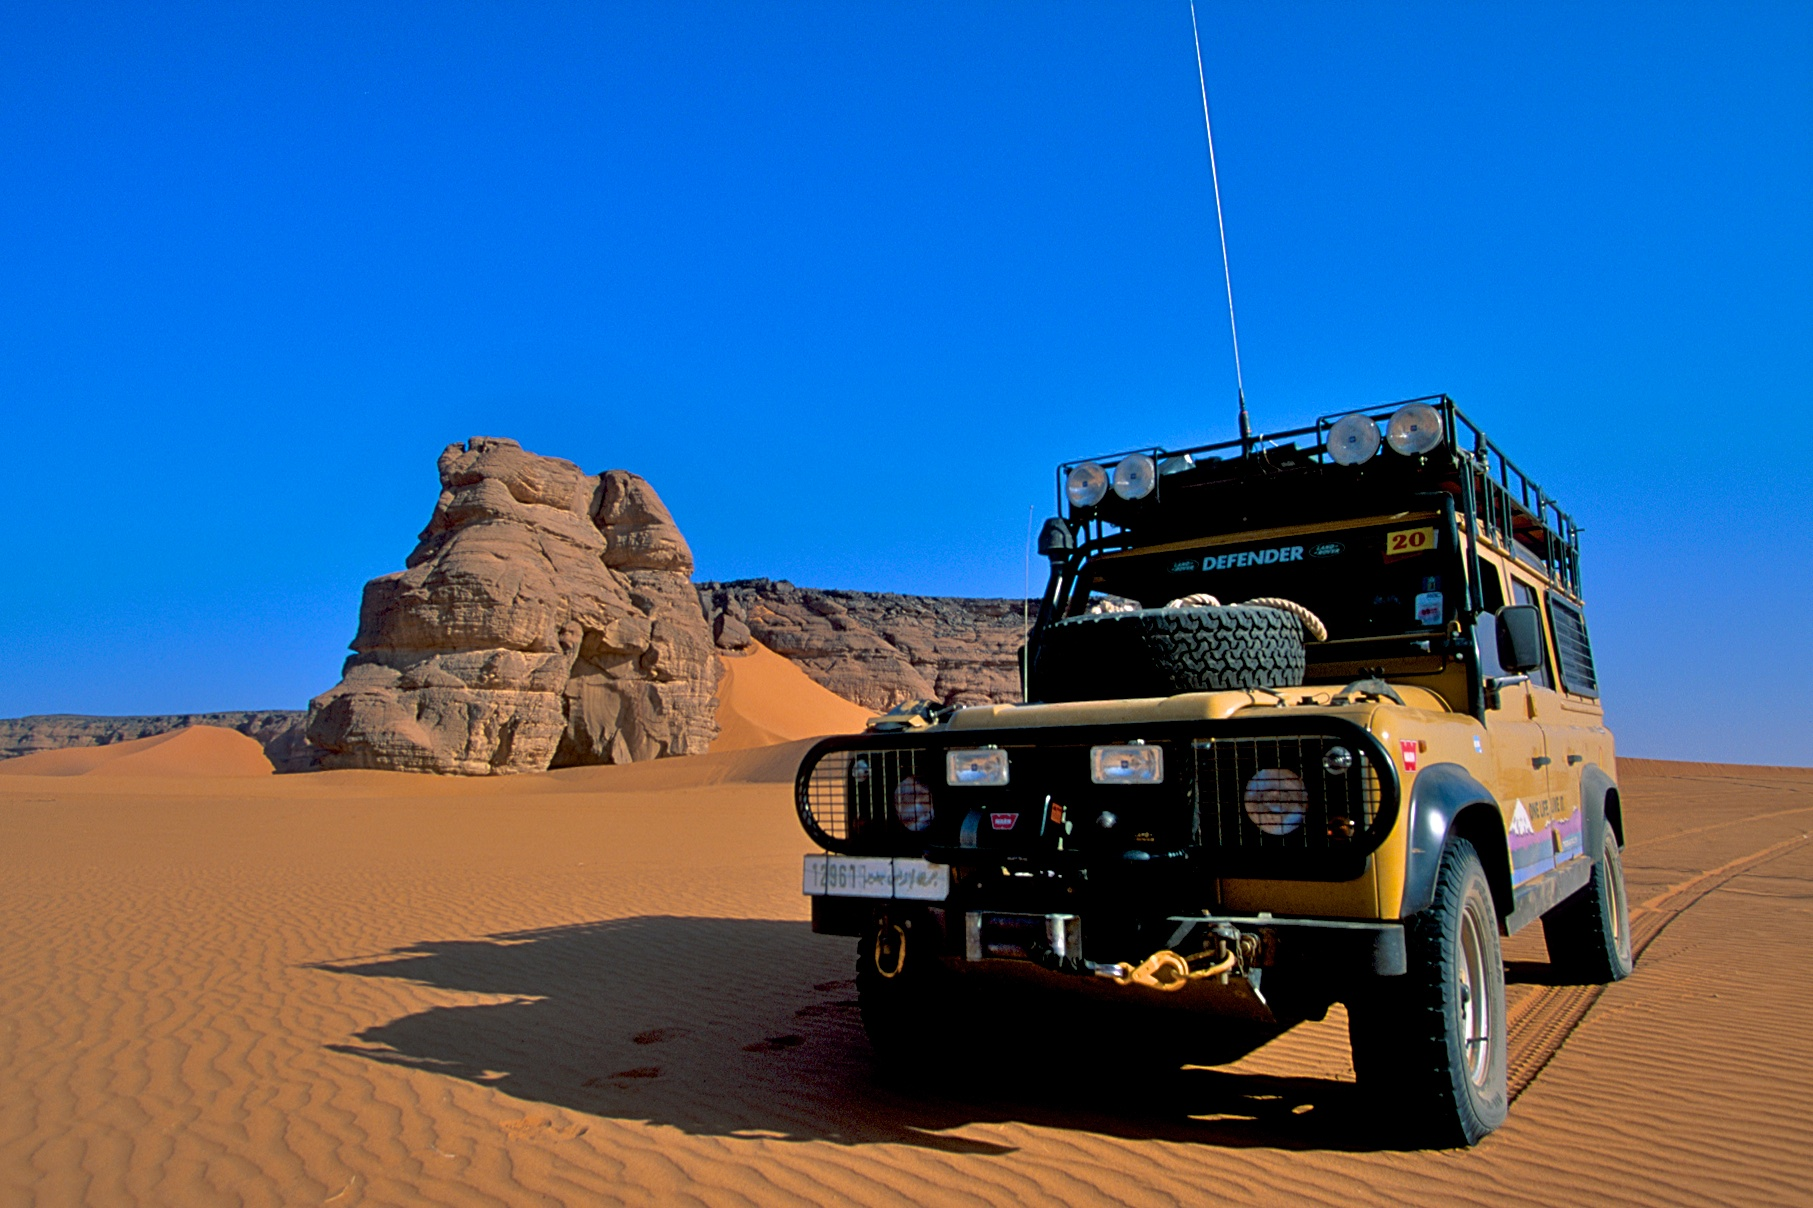 Specifications 1998 Land Rover Defender 110 Camel Trophy